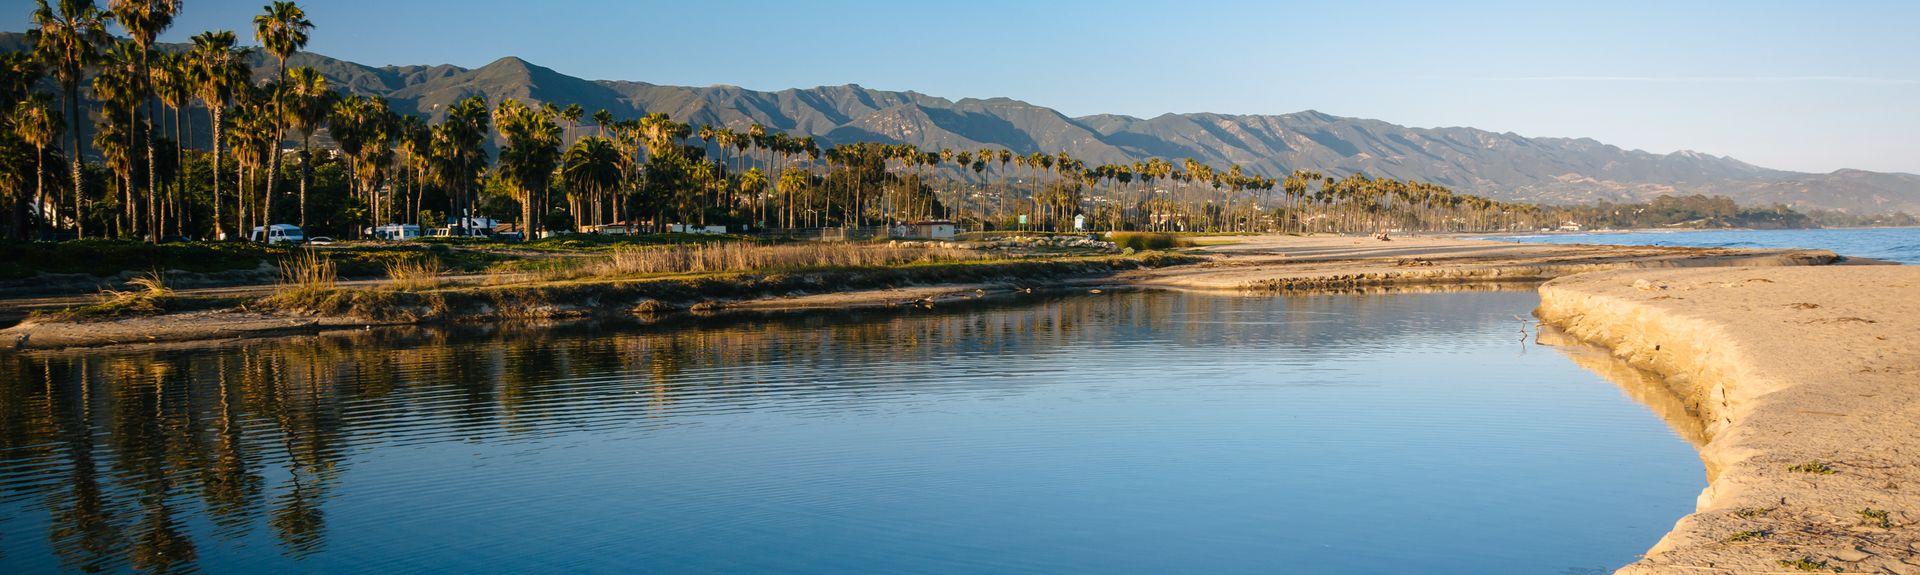 Upper Riviera, Santa Barbara, California, United States of America